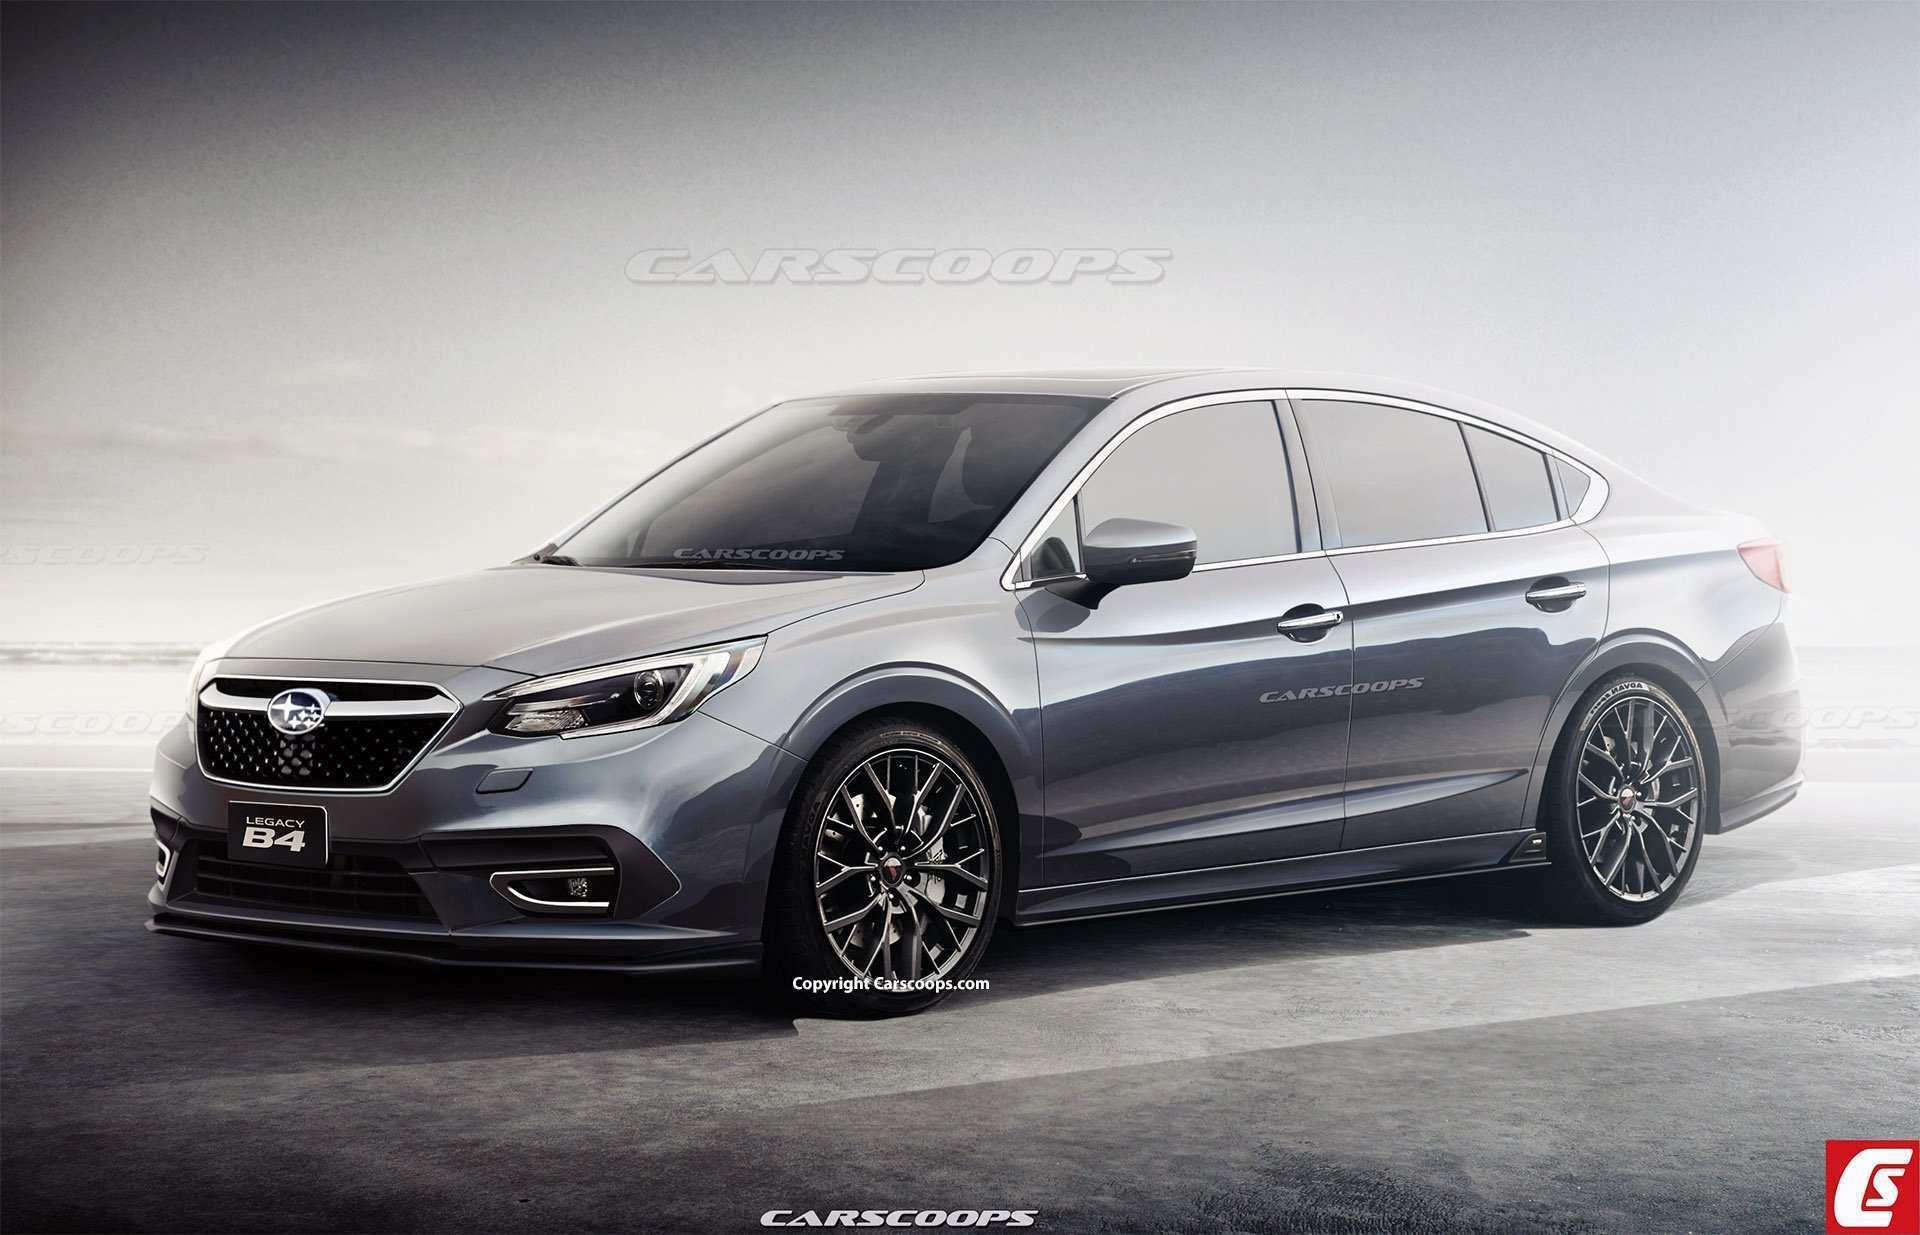 57 Concept of Subaru 2020 Exterior Release Date by Subaru 2020 Exterior